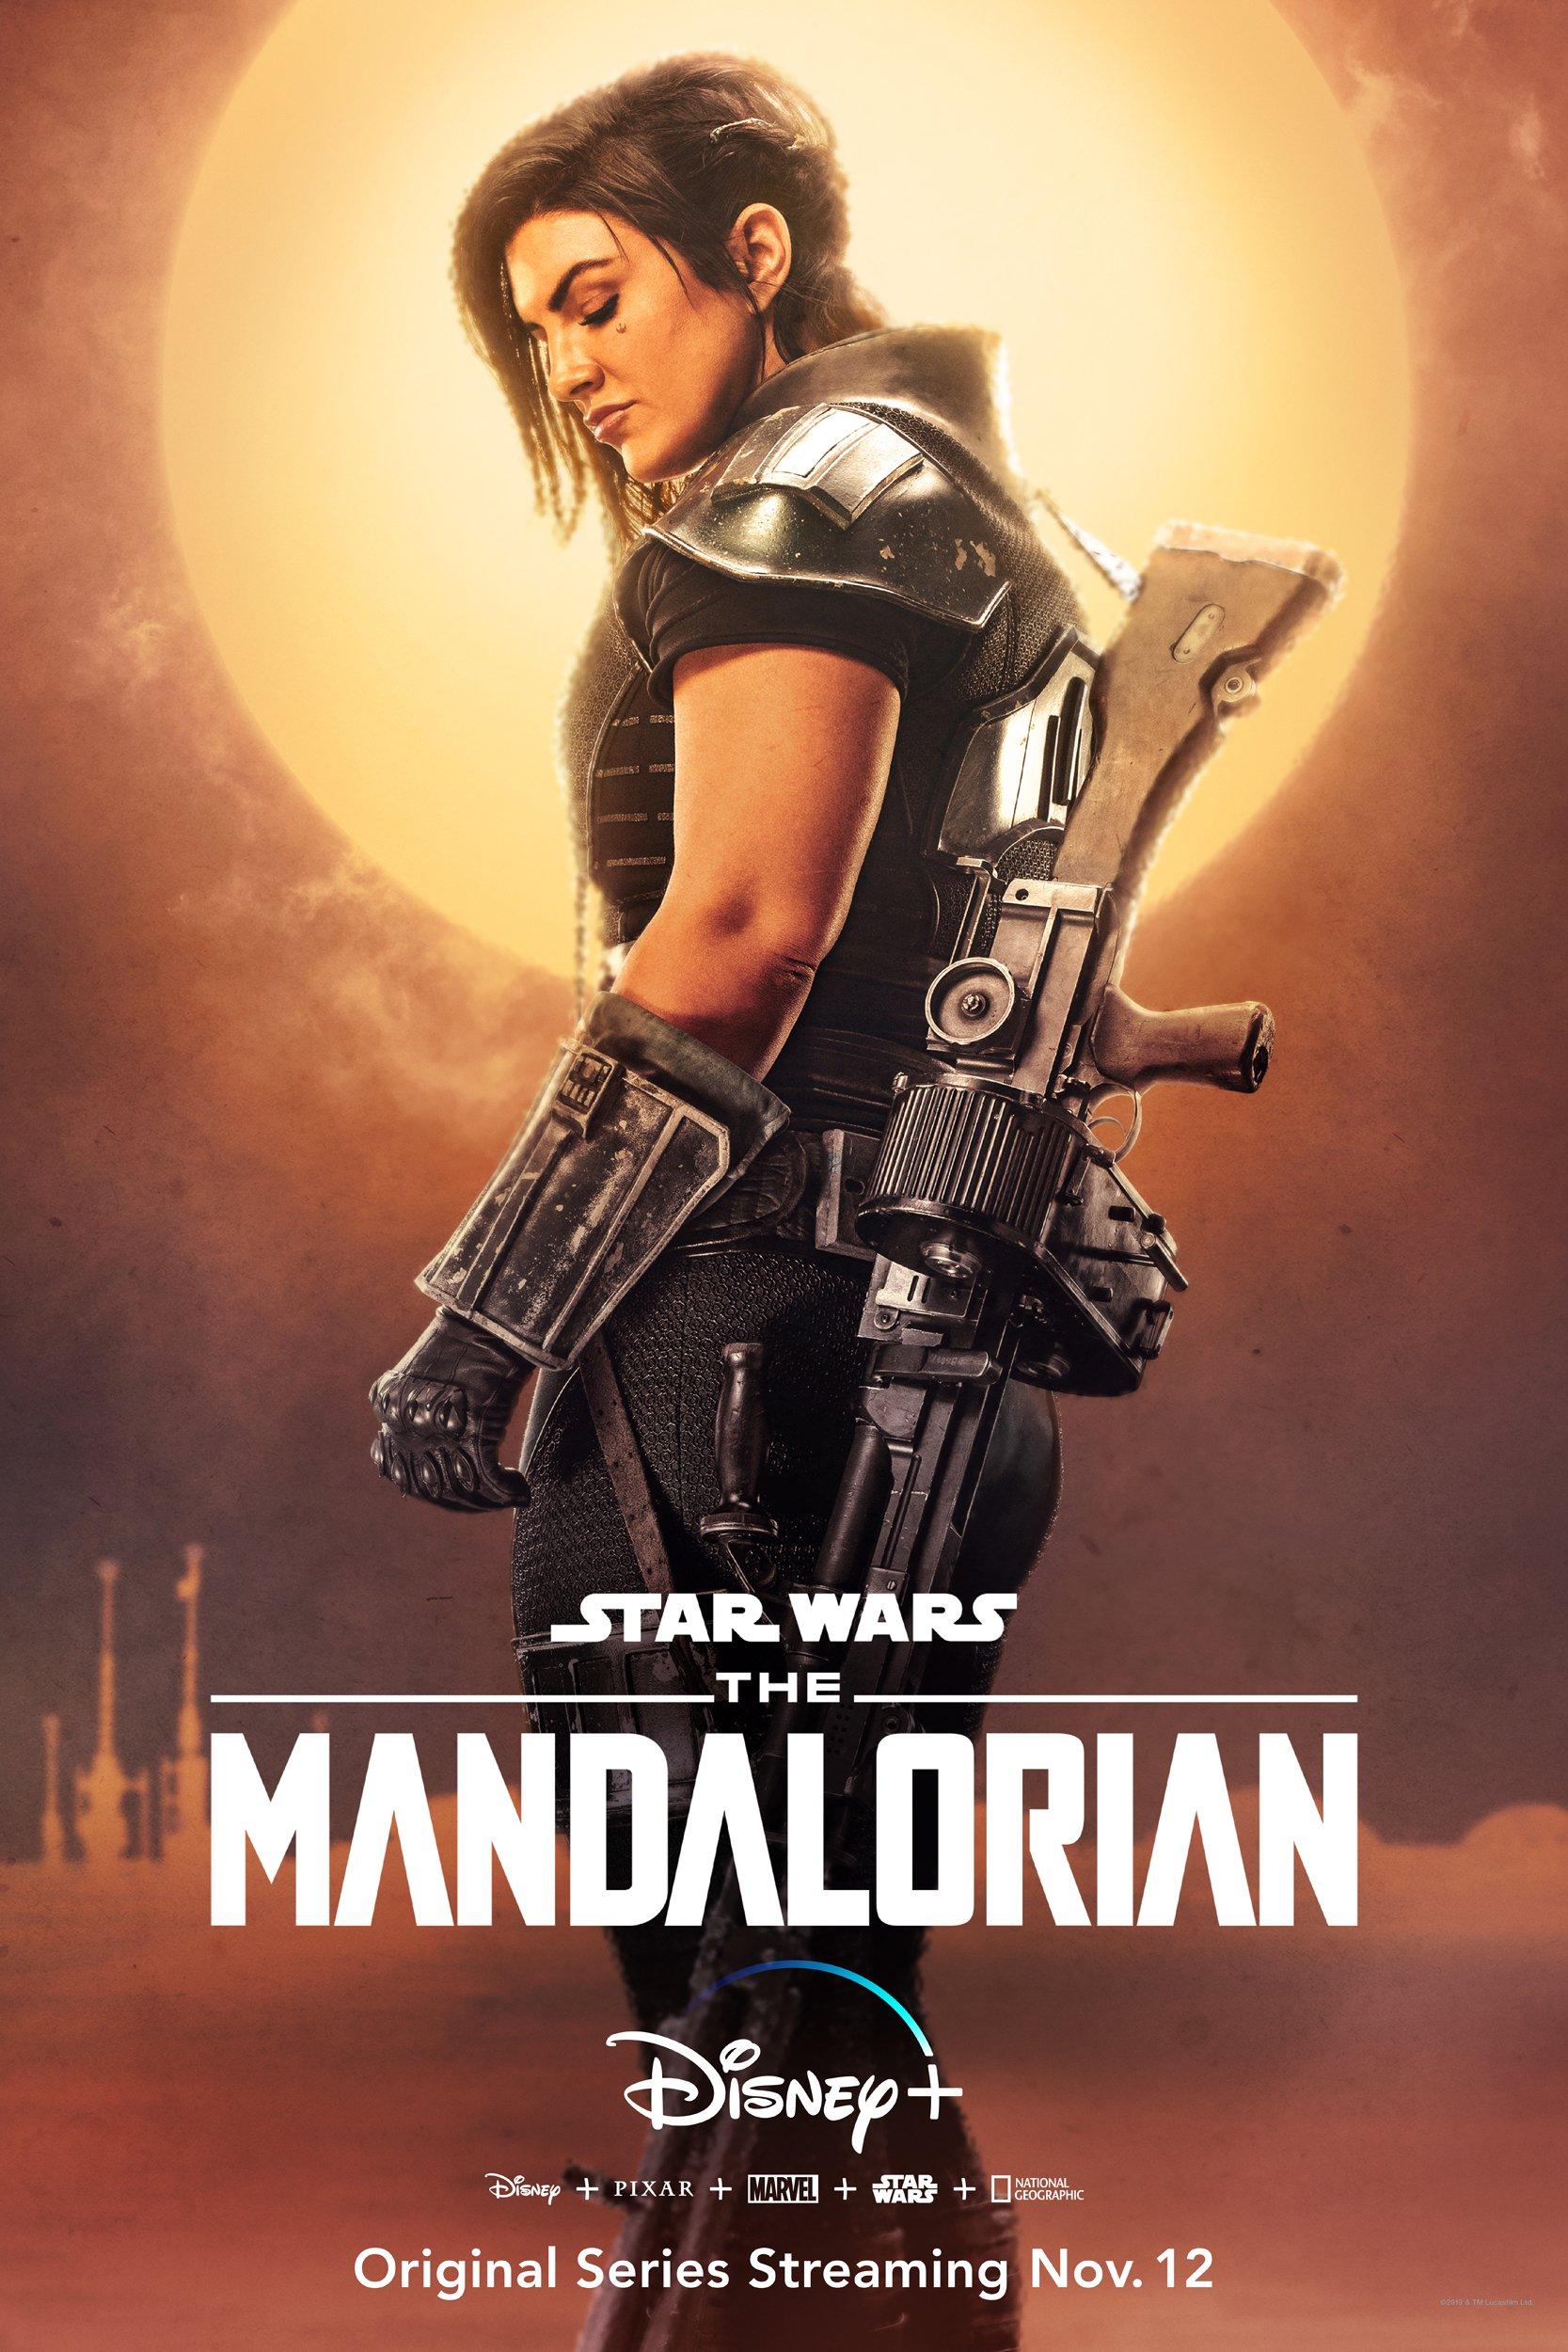 The Mandalorian - Cara Dune Poster